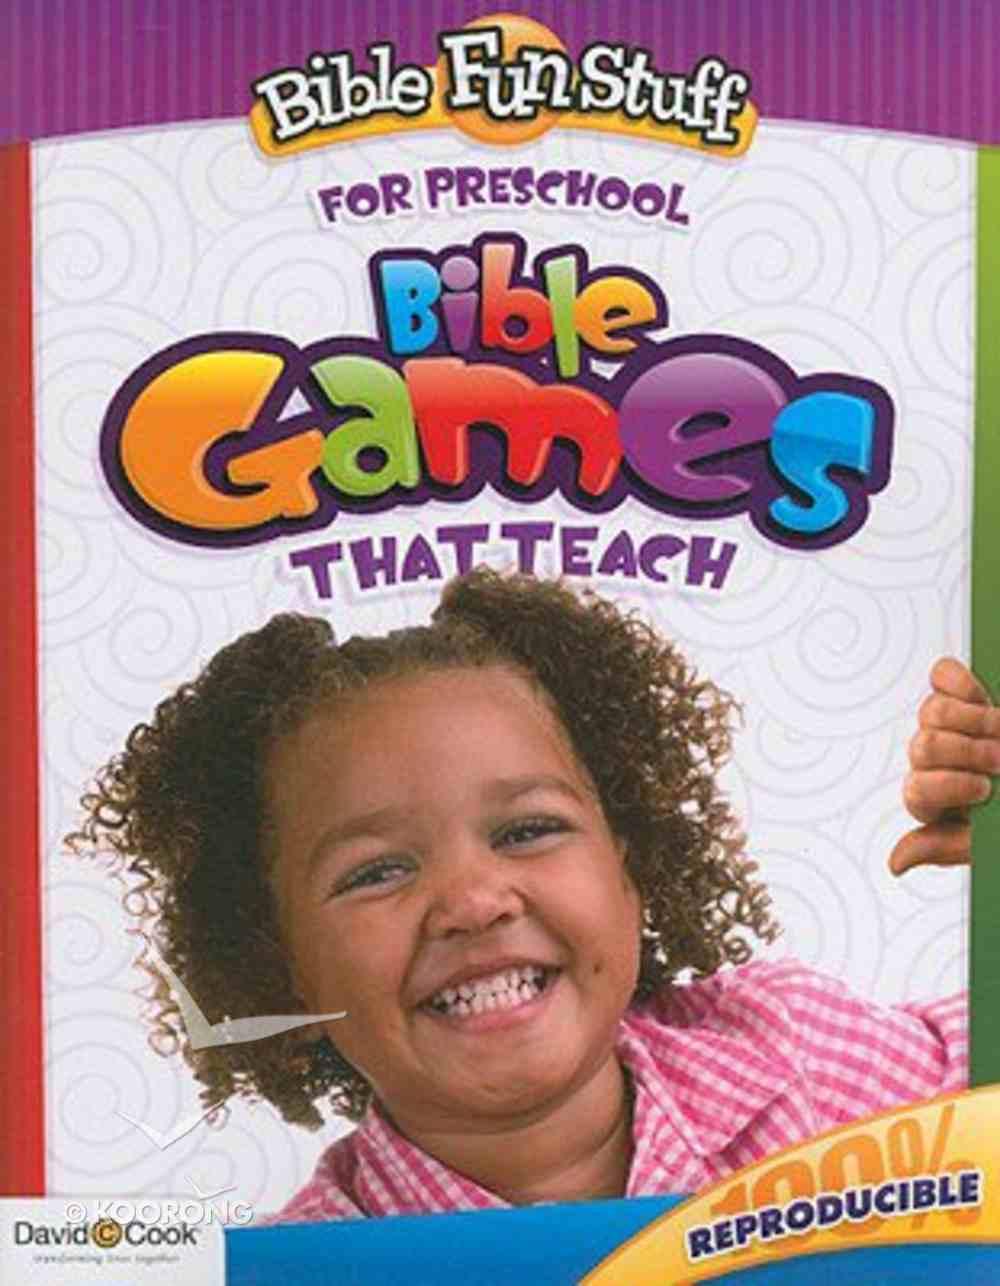 Bible Games That Teach (Reproducible) (Pre-School) (Bible Fun Stuff Series) Paperback